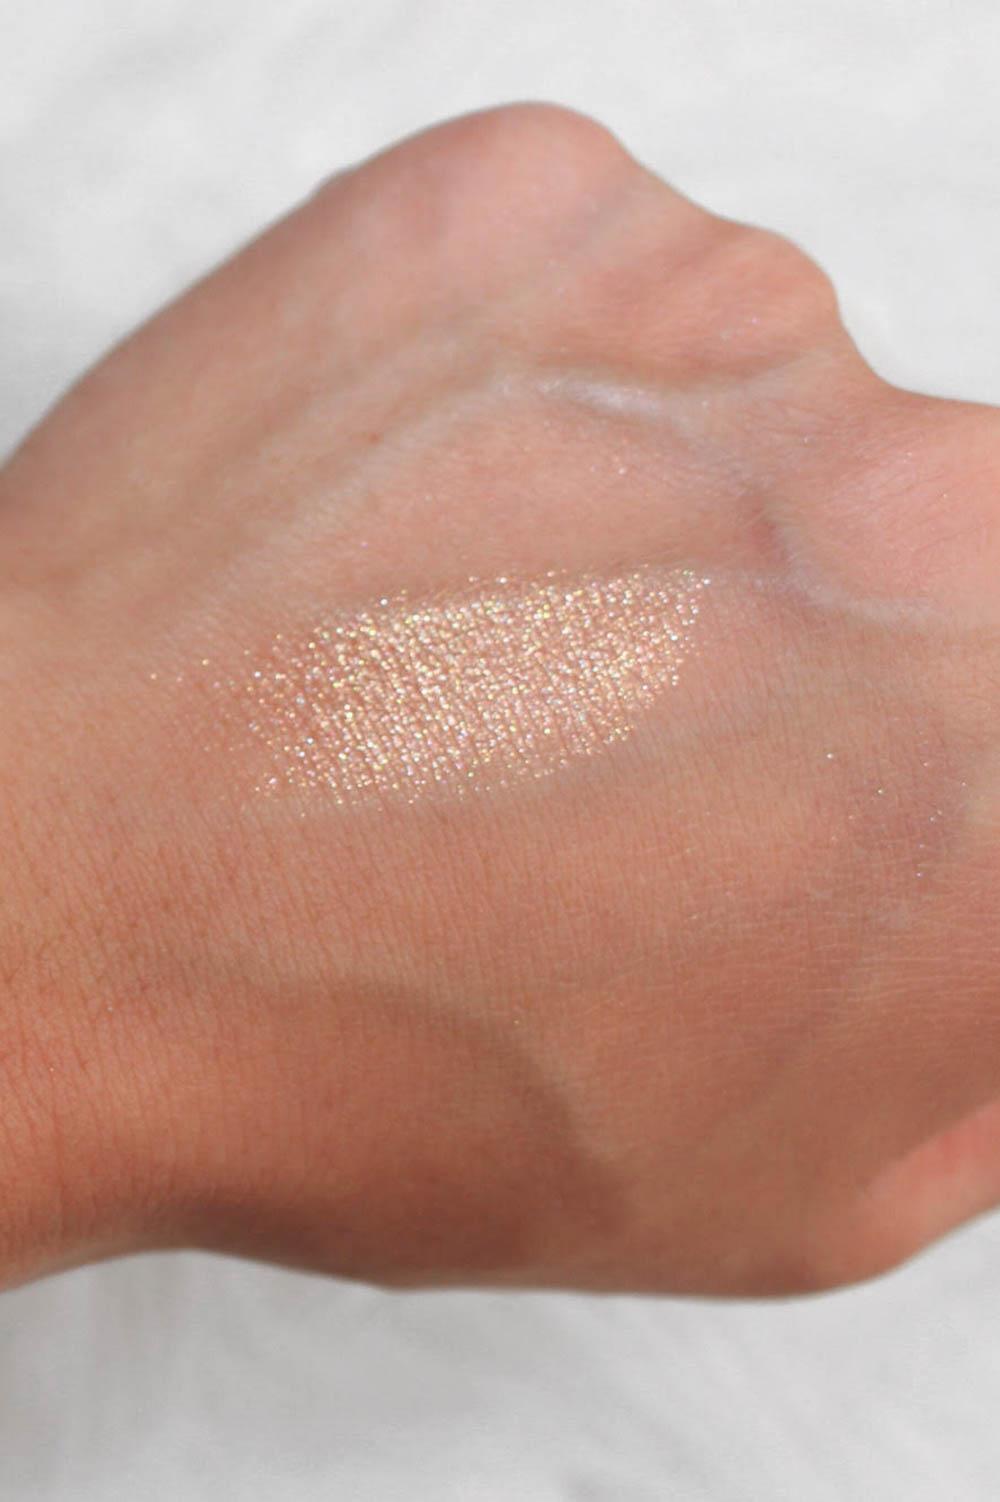 Diamond Glow Powder by Artist Couture #3